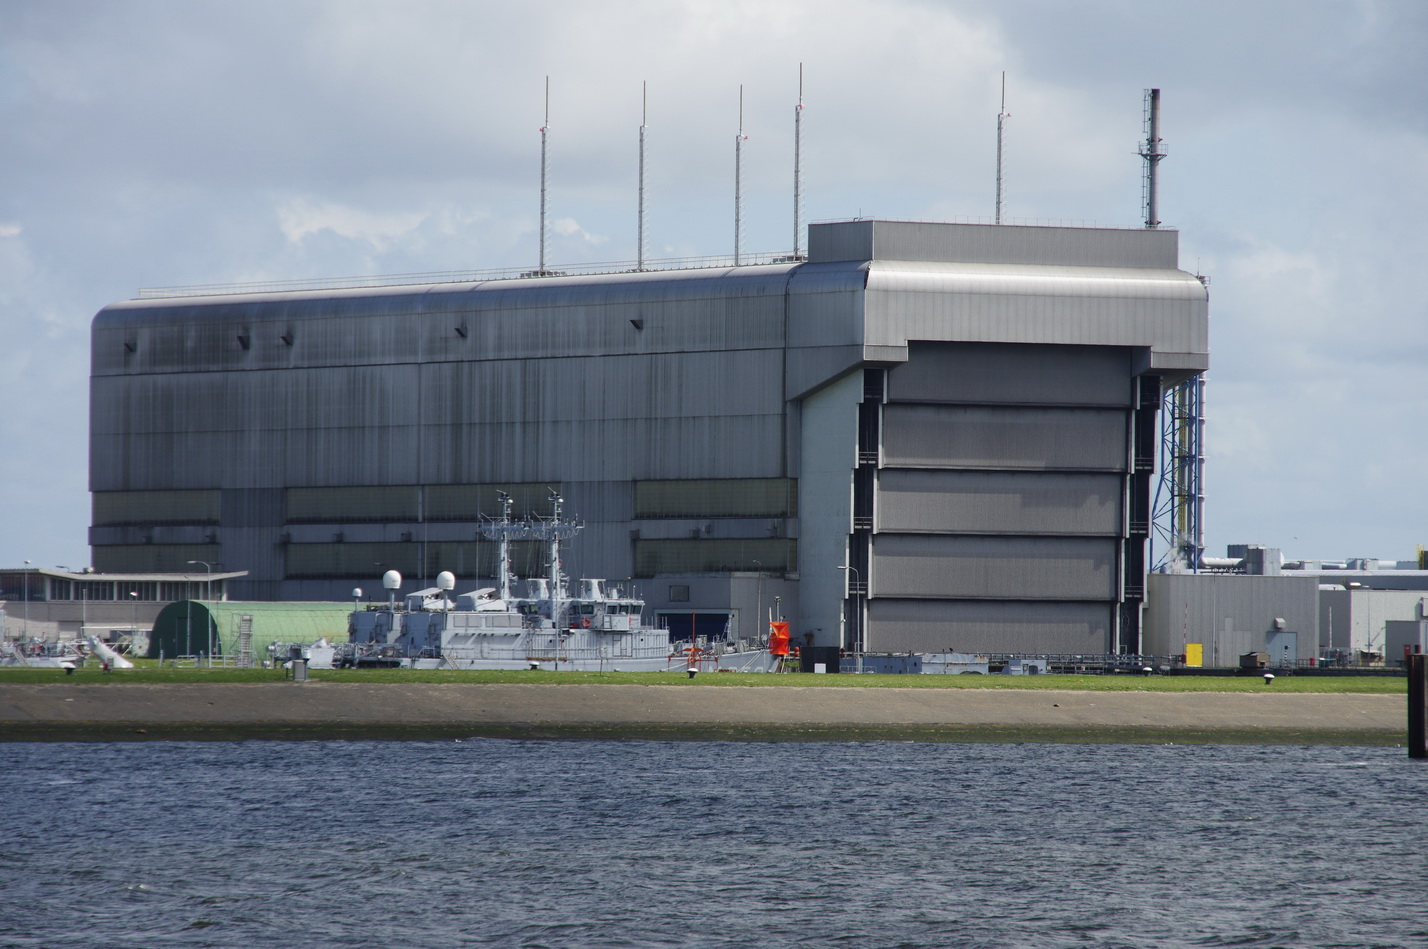 Texel - Schifffahrt Texel 44 TH 12